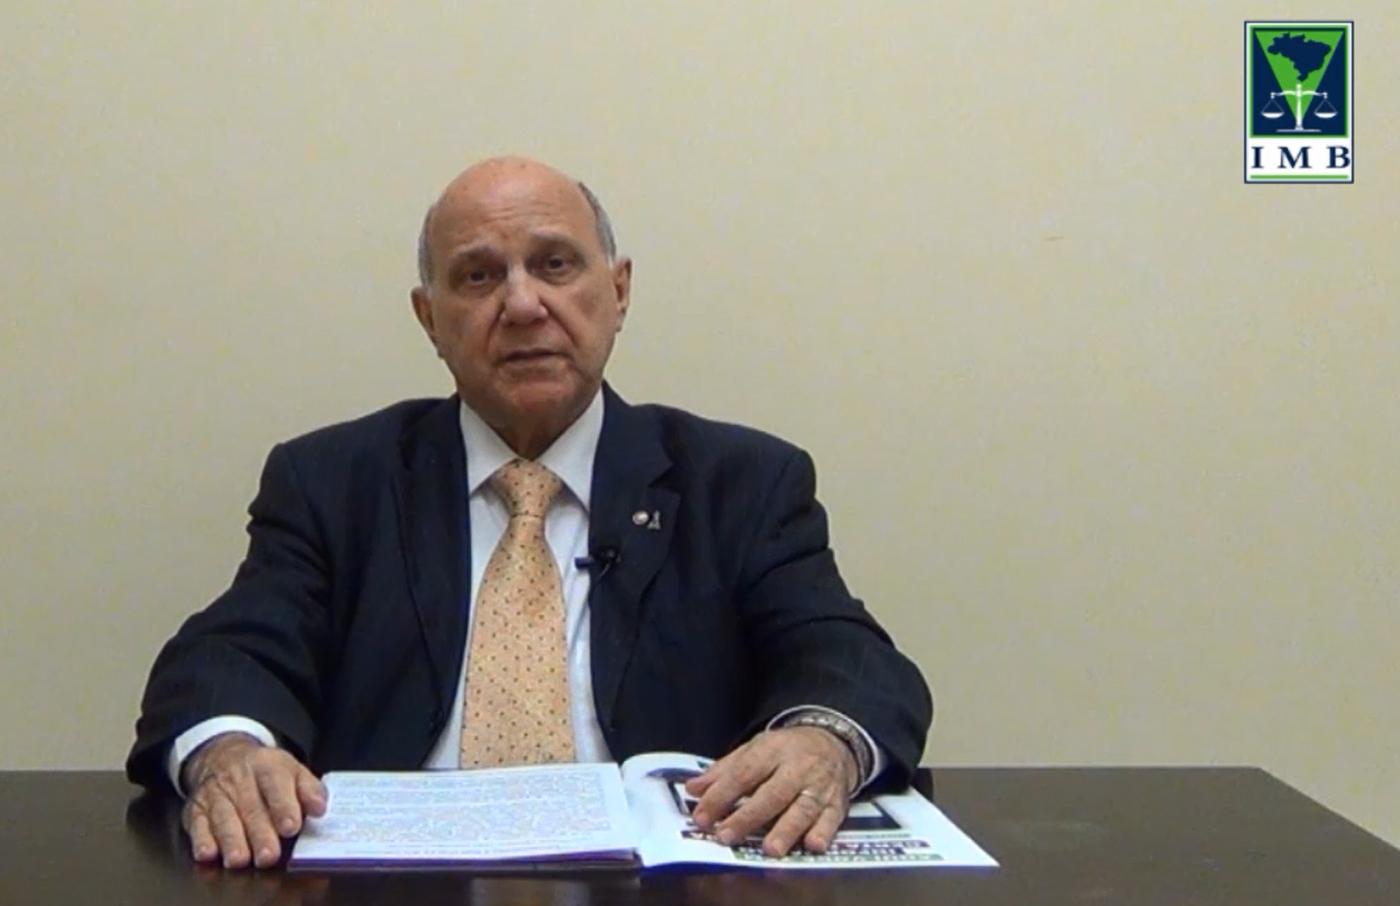 Desembargador Roberto Guimarães - Mensagem de Final de Mandato